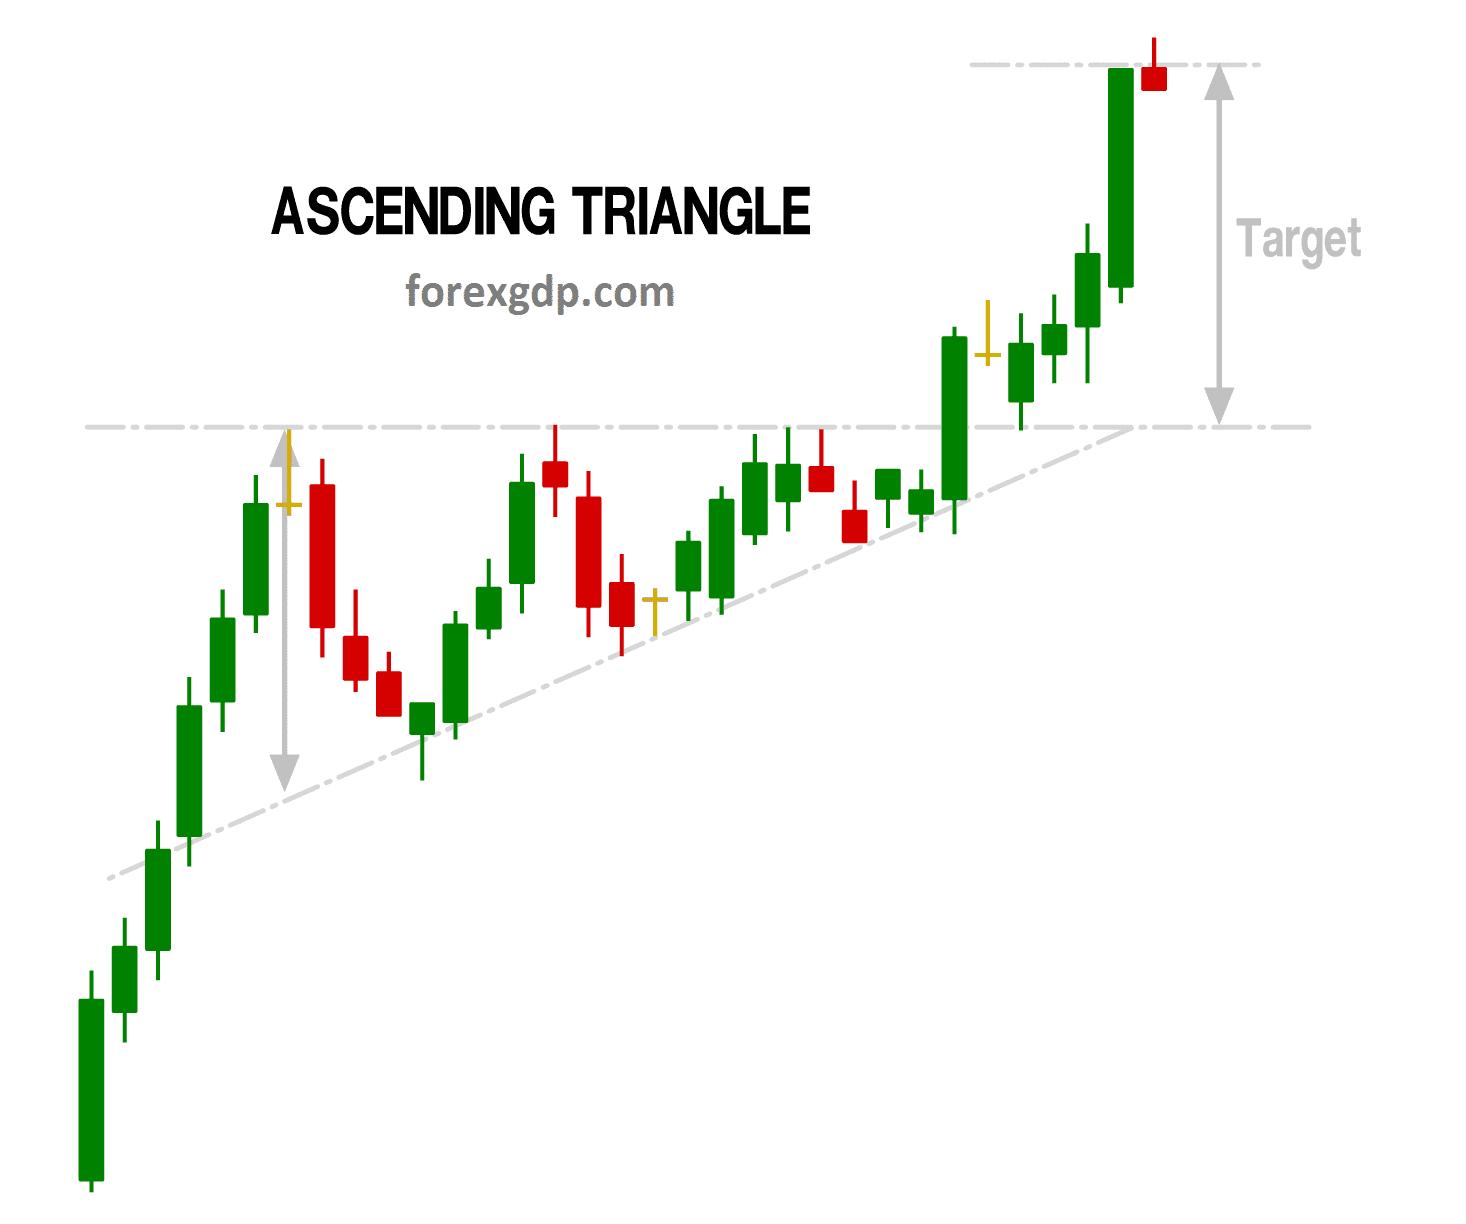 Ascending triangle take profit target